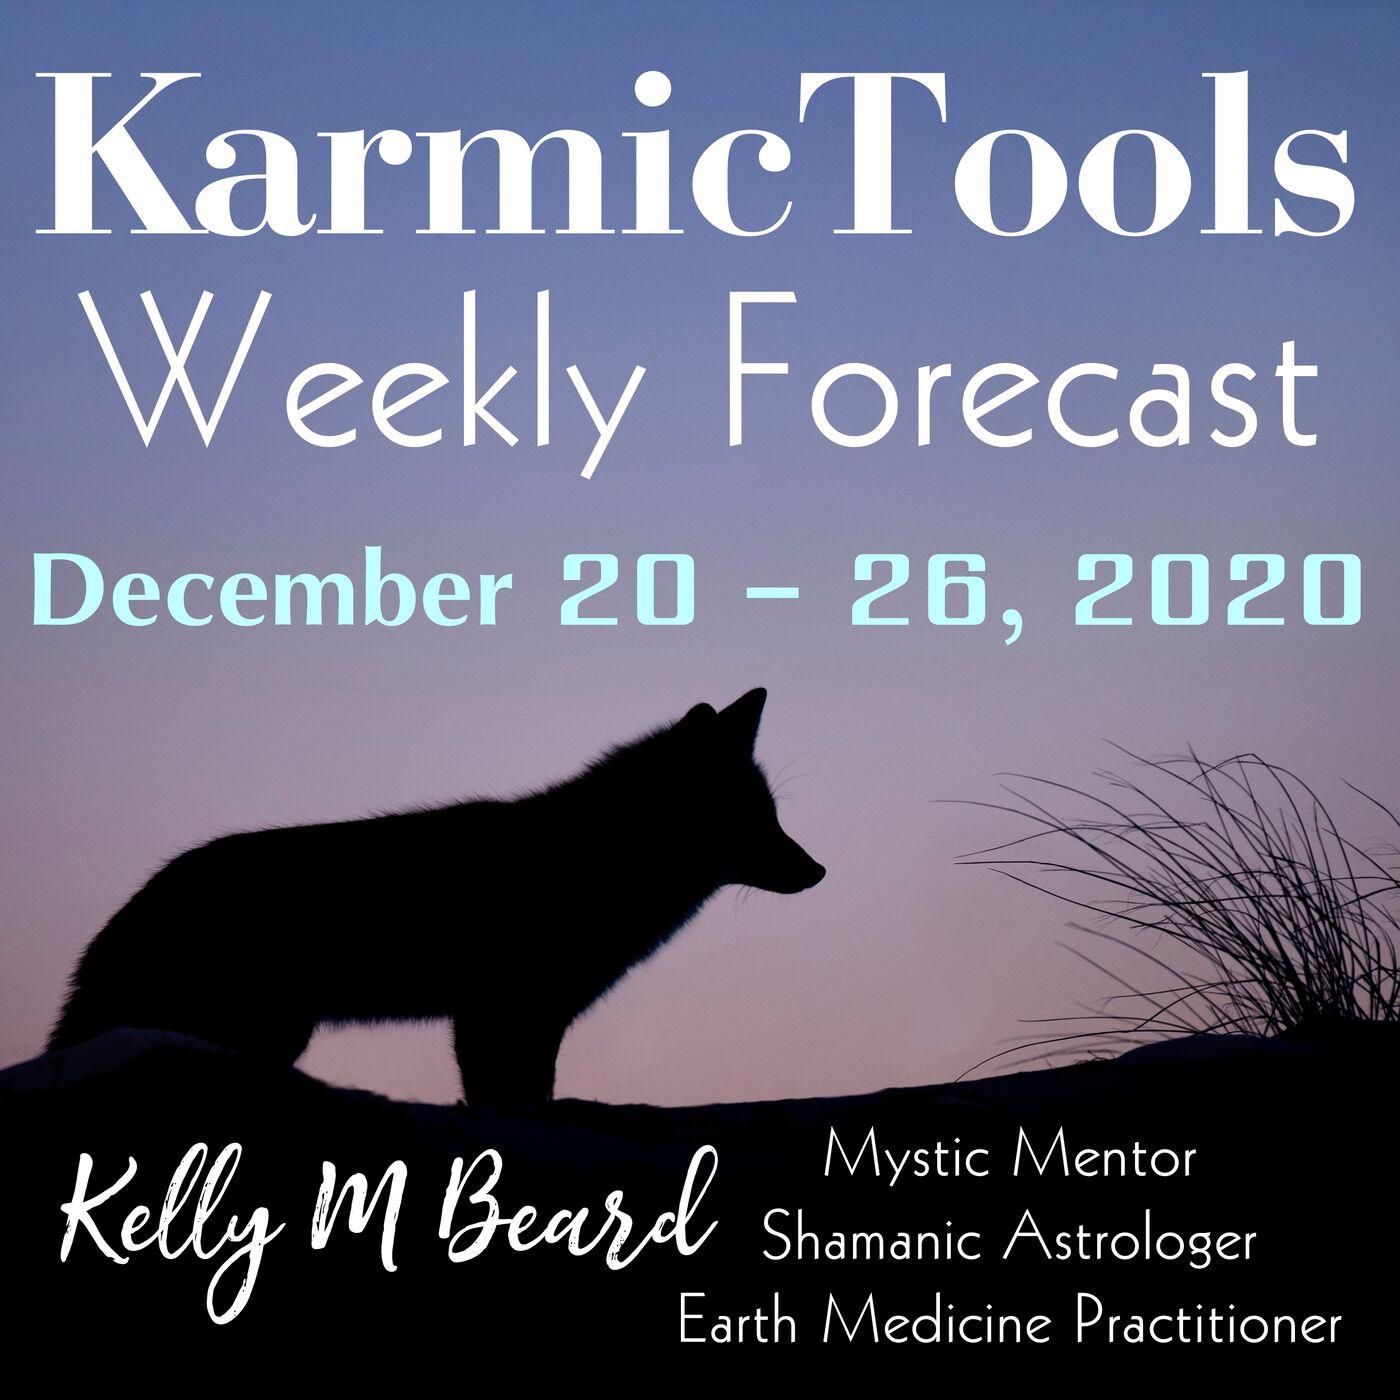 Dec 20 - 26, 2020 KarmicTools Weekly Forecast